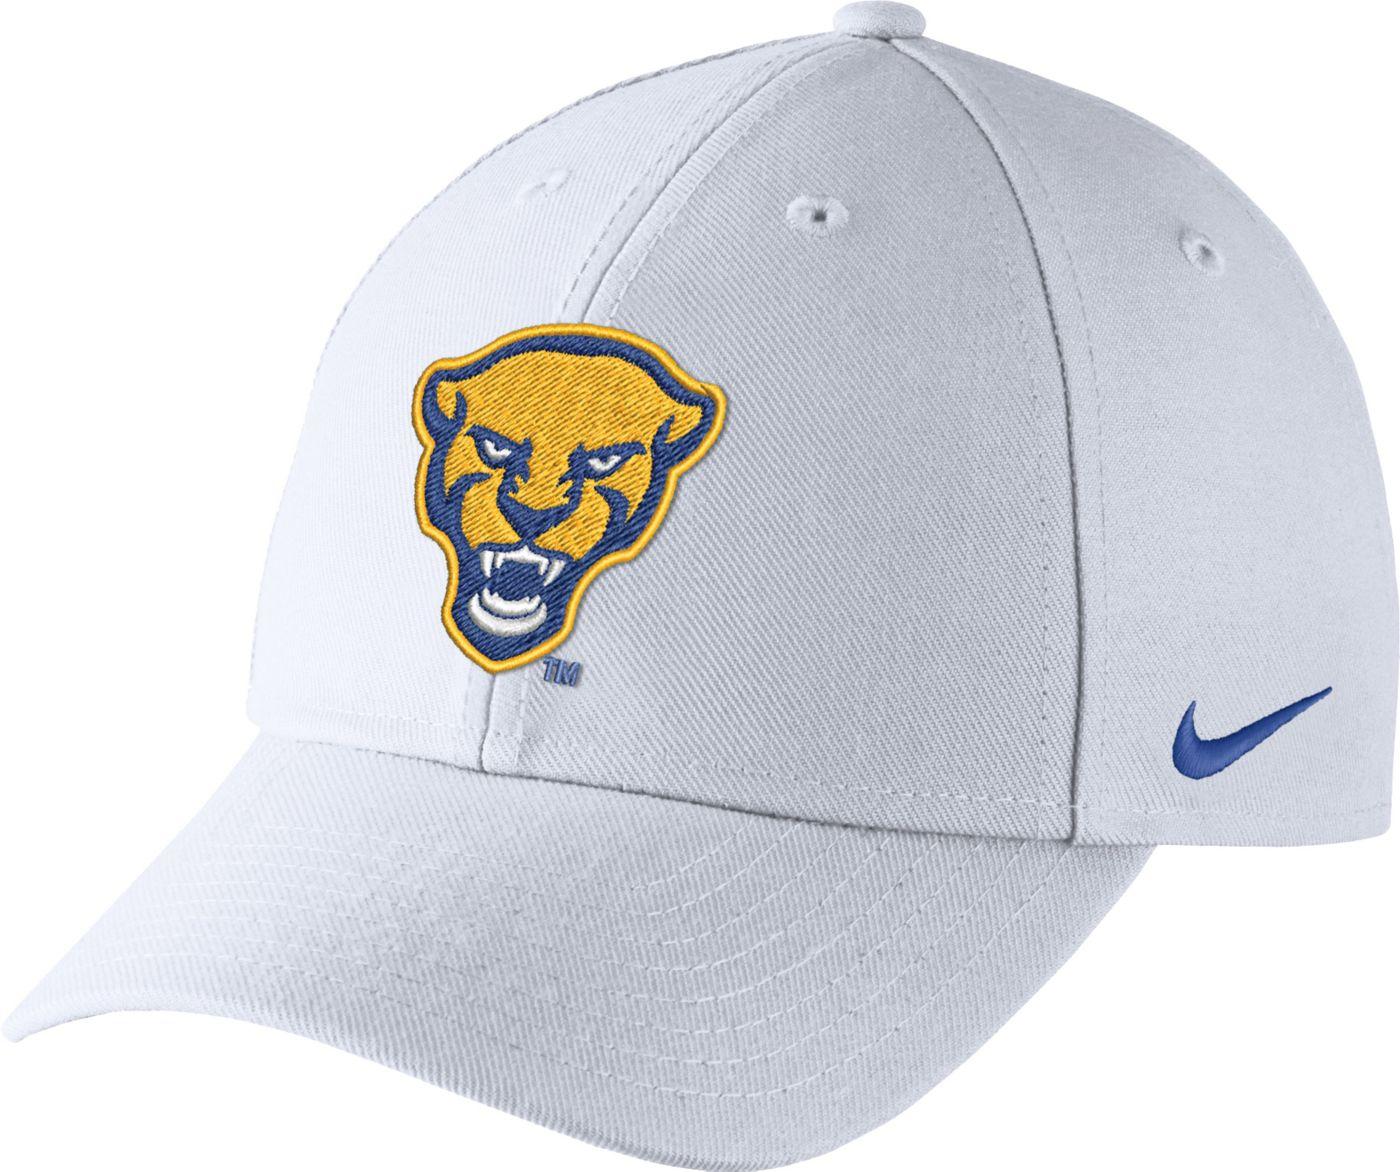 Nike Men's Pitt Panthers Dri-FIT Wool Classic White Hat